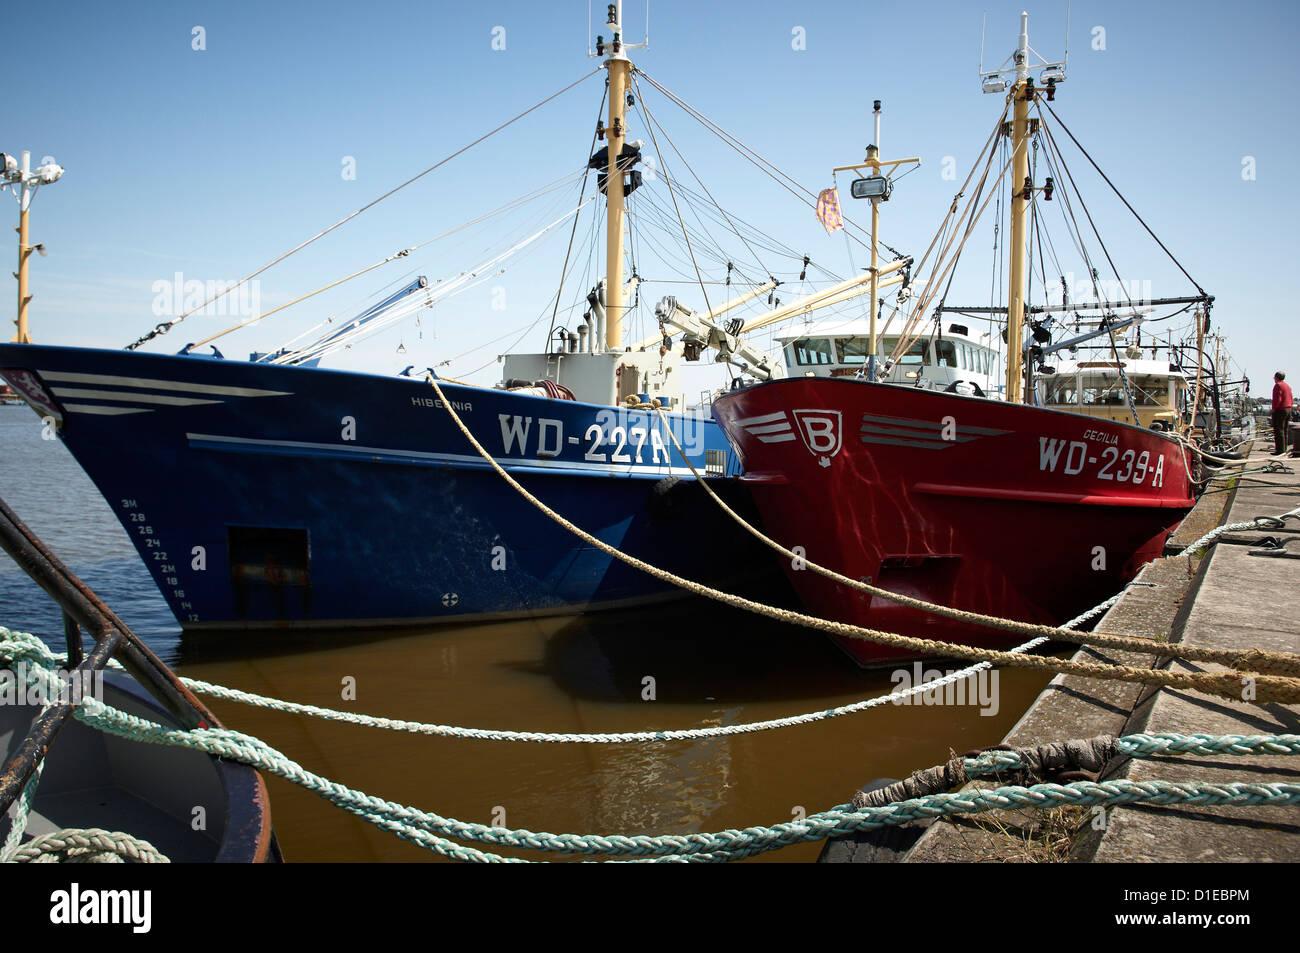 Fishing fleet, Wexford, Leinster, Republic of Ireland, Europe - Stock Image